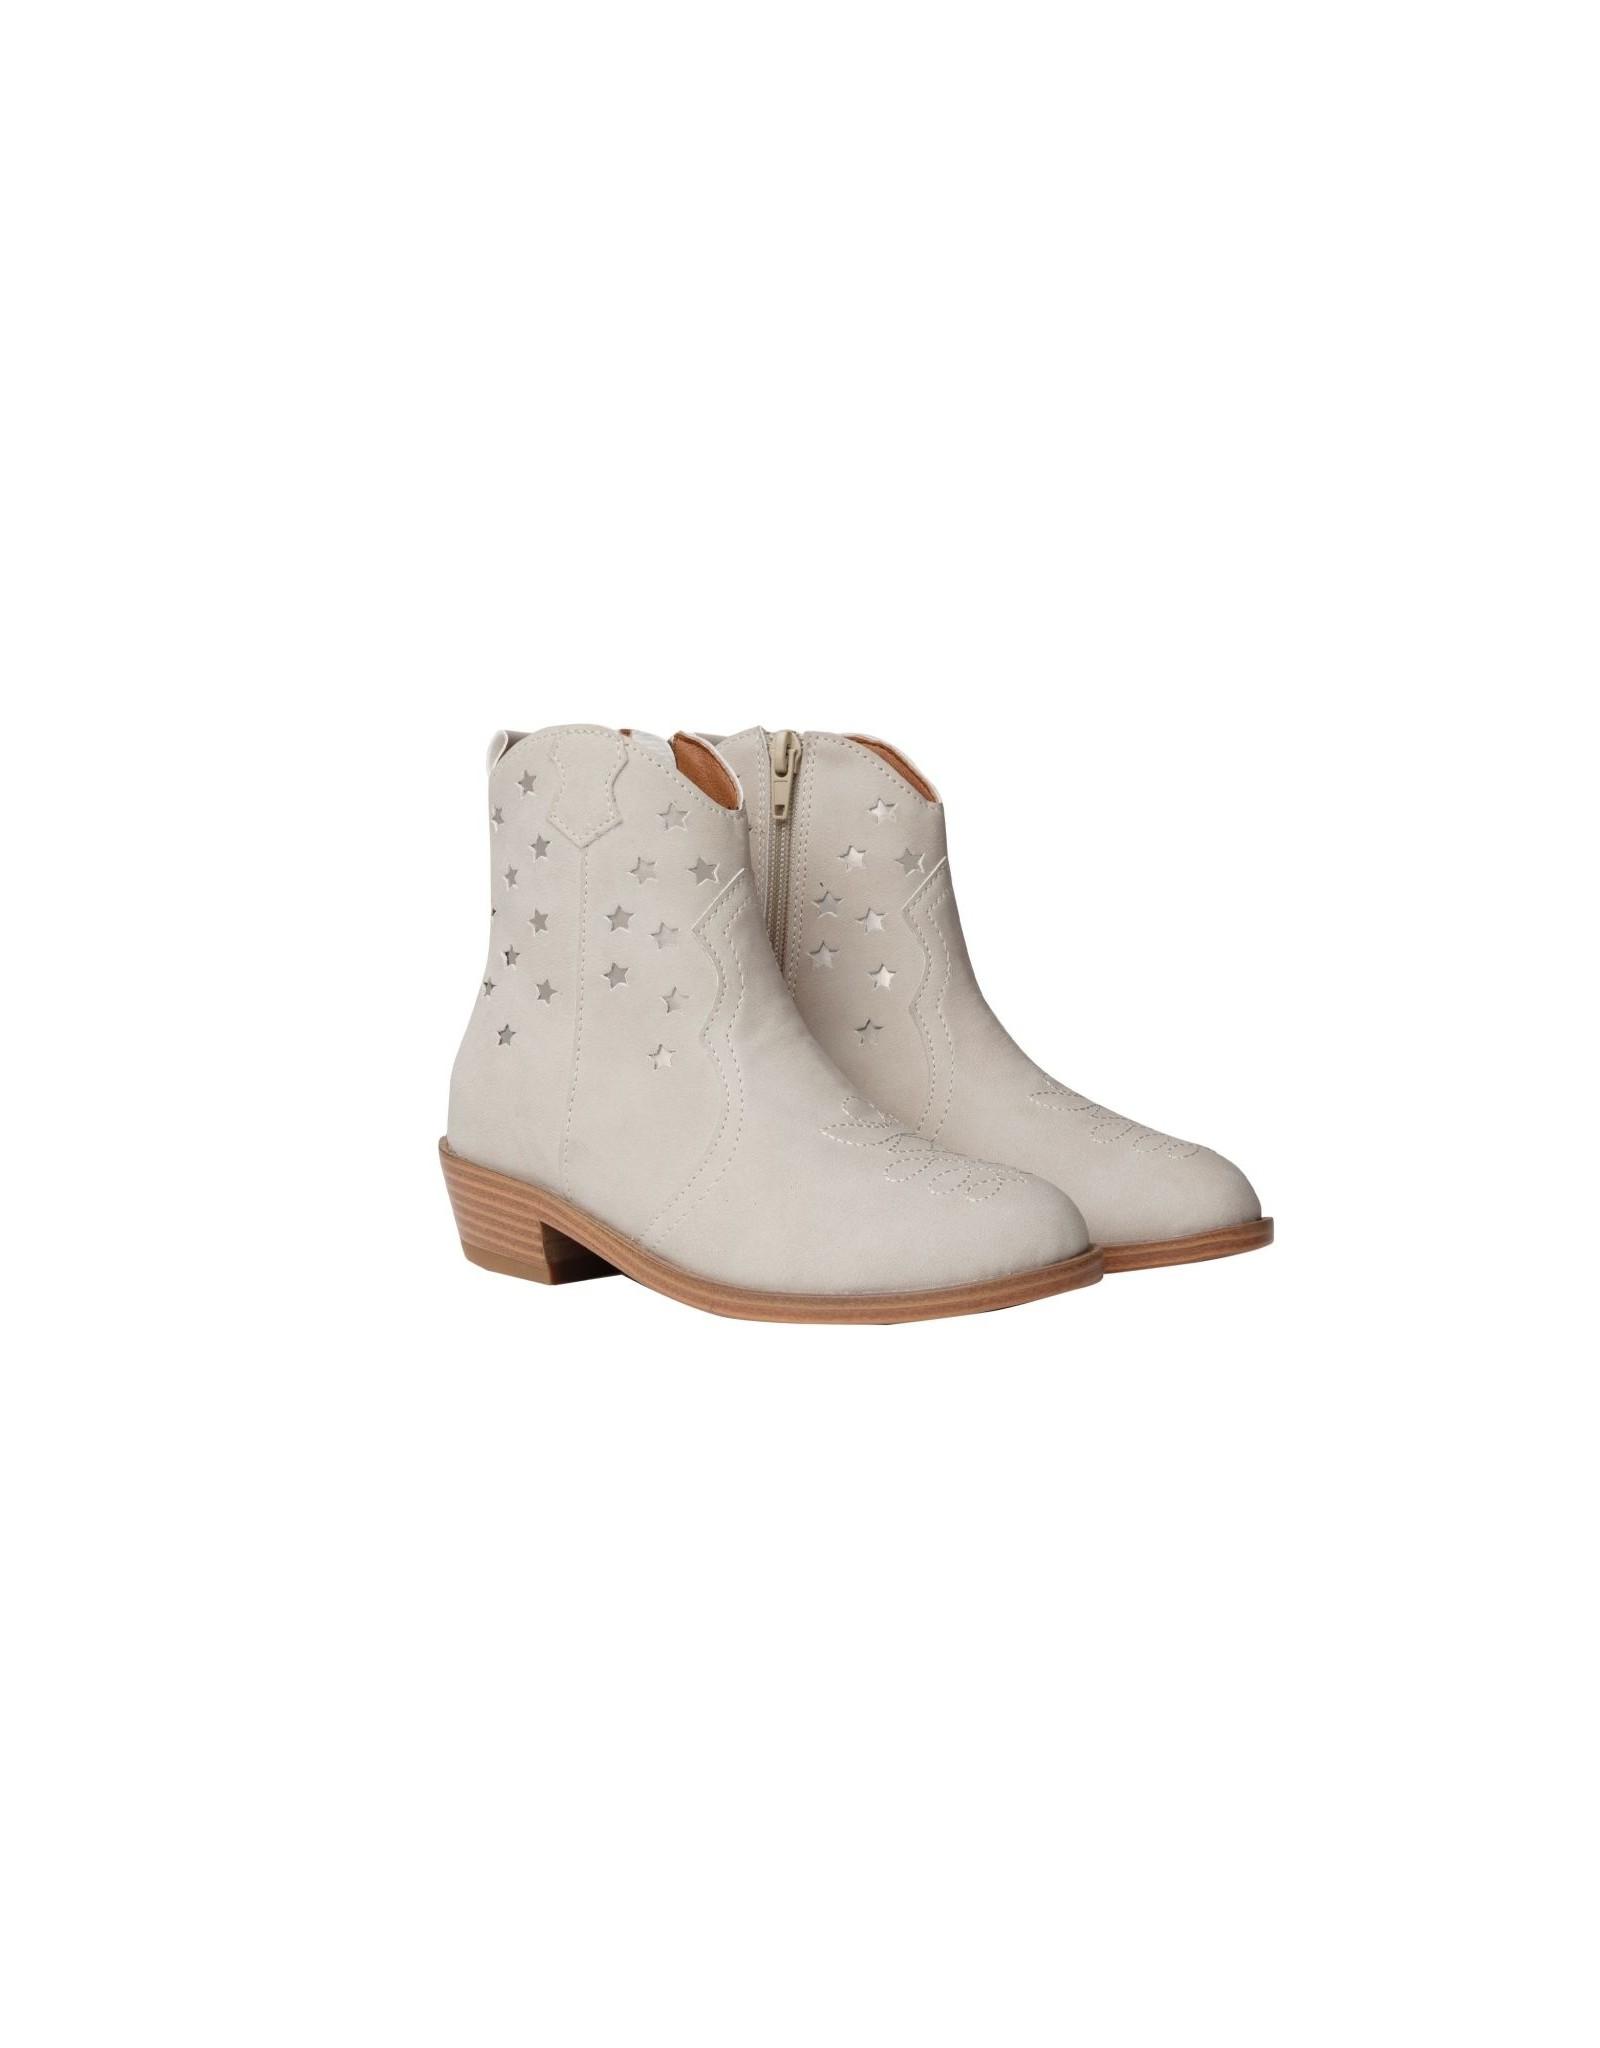 Rylee and Cru western boot- stars